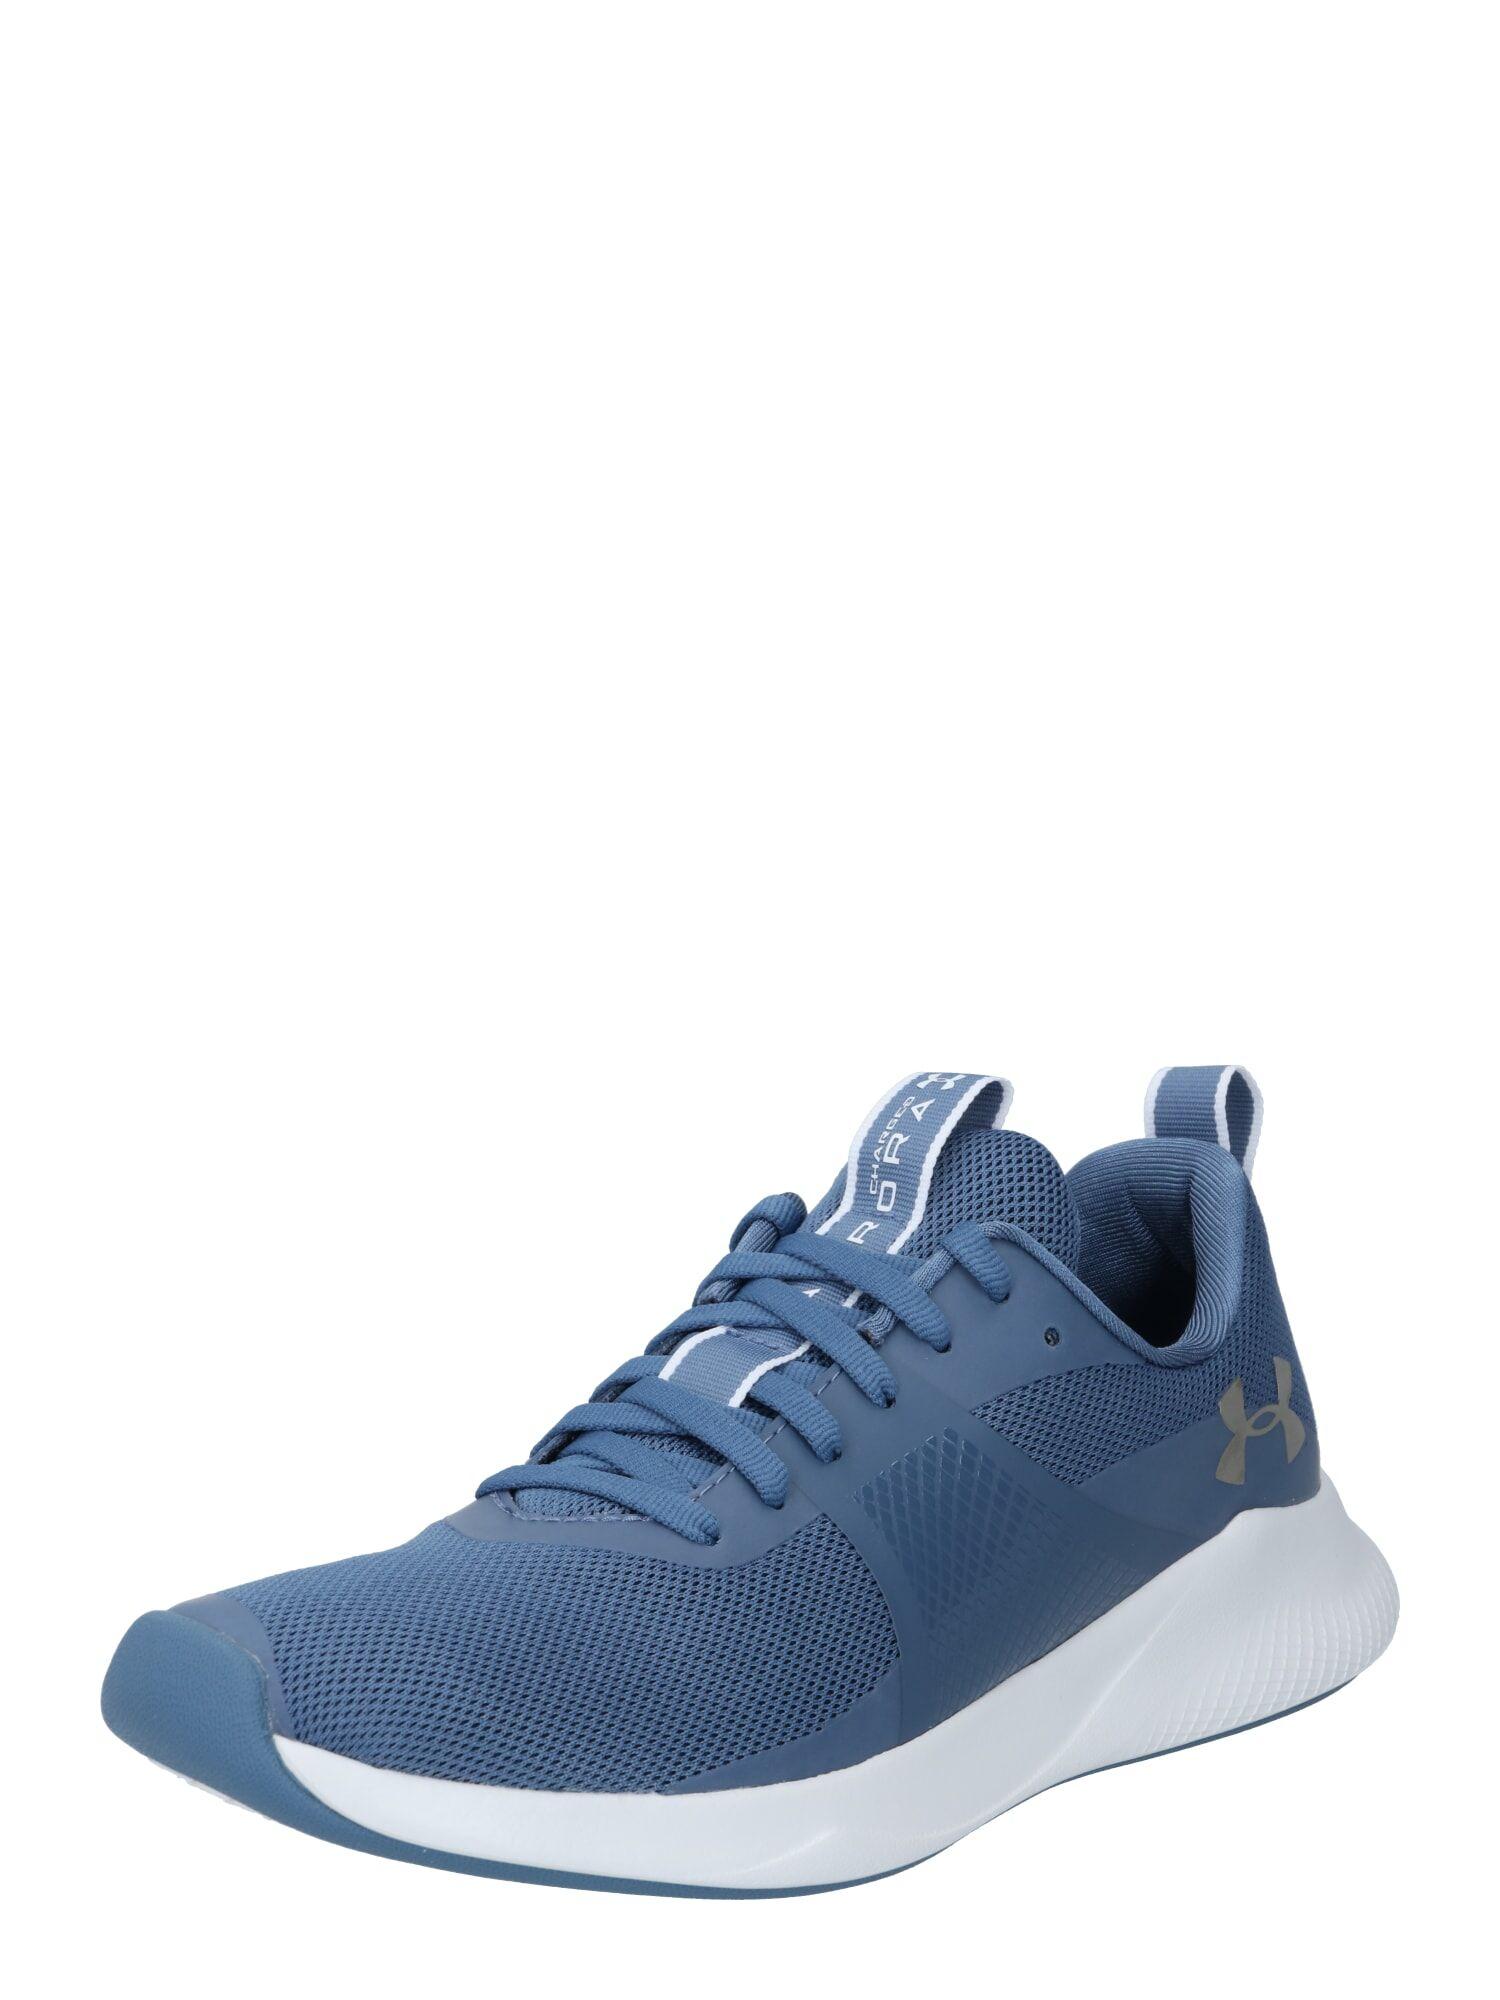 UNDER ARMOUR Chaussure de sport 'Aurora'  - Bleu - Taille: 8.5 - female